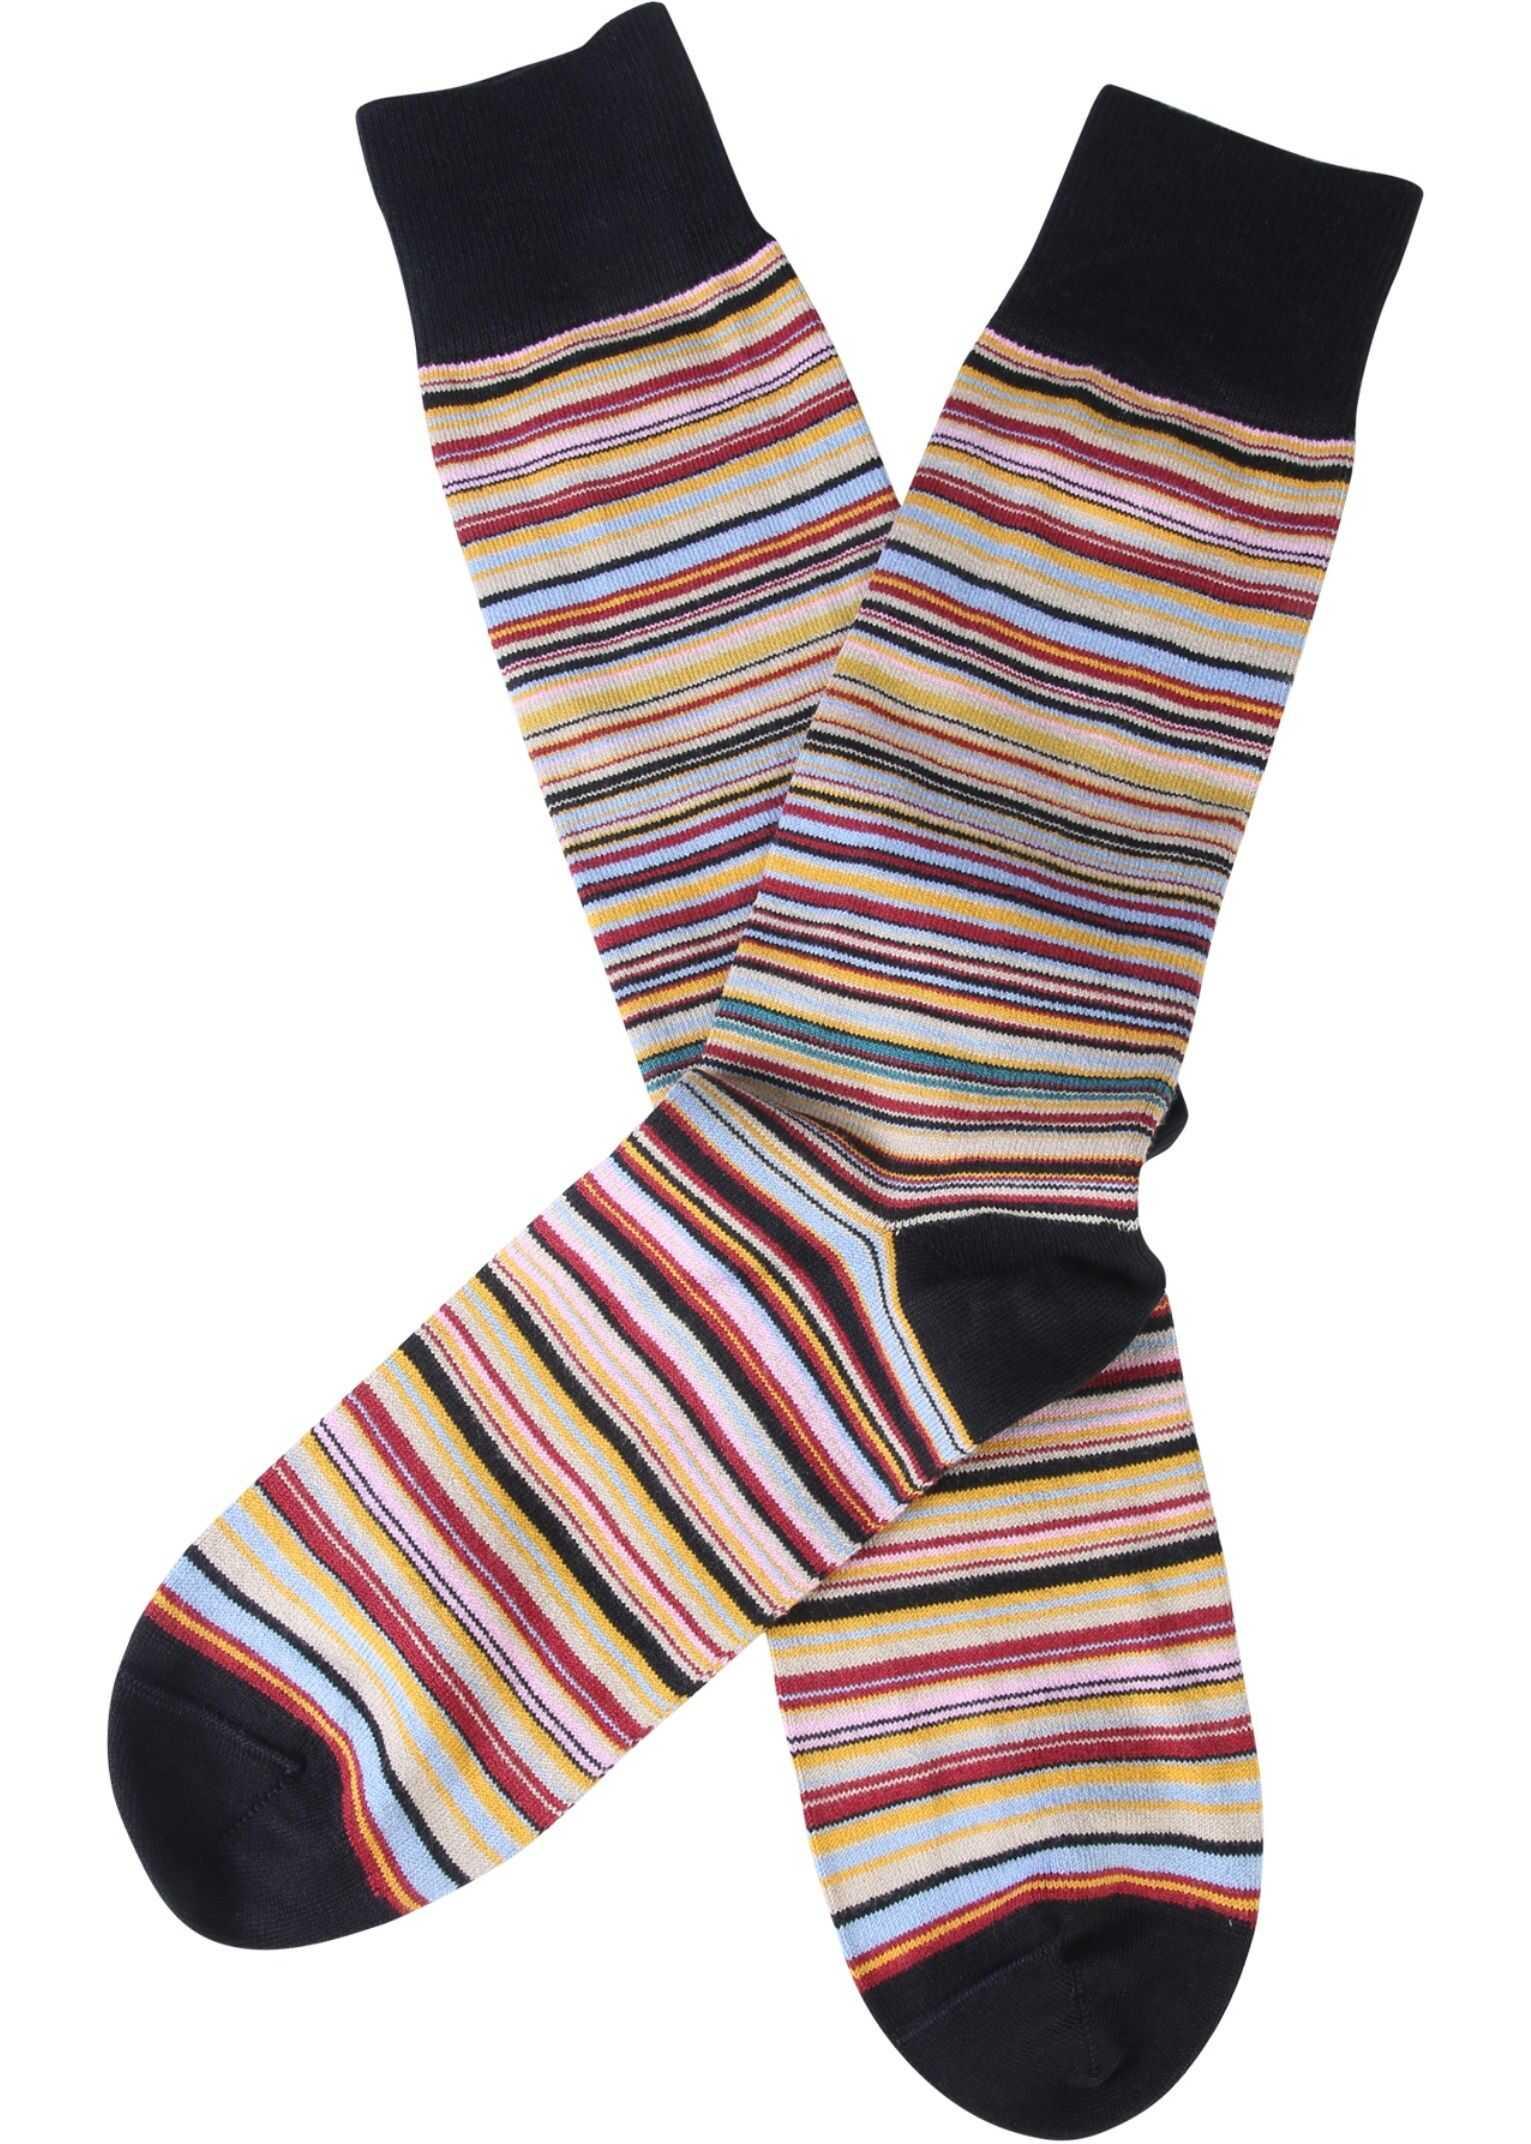 Paul Smith Striped Socks MULTICOLOUR imagine